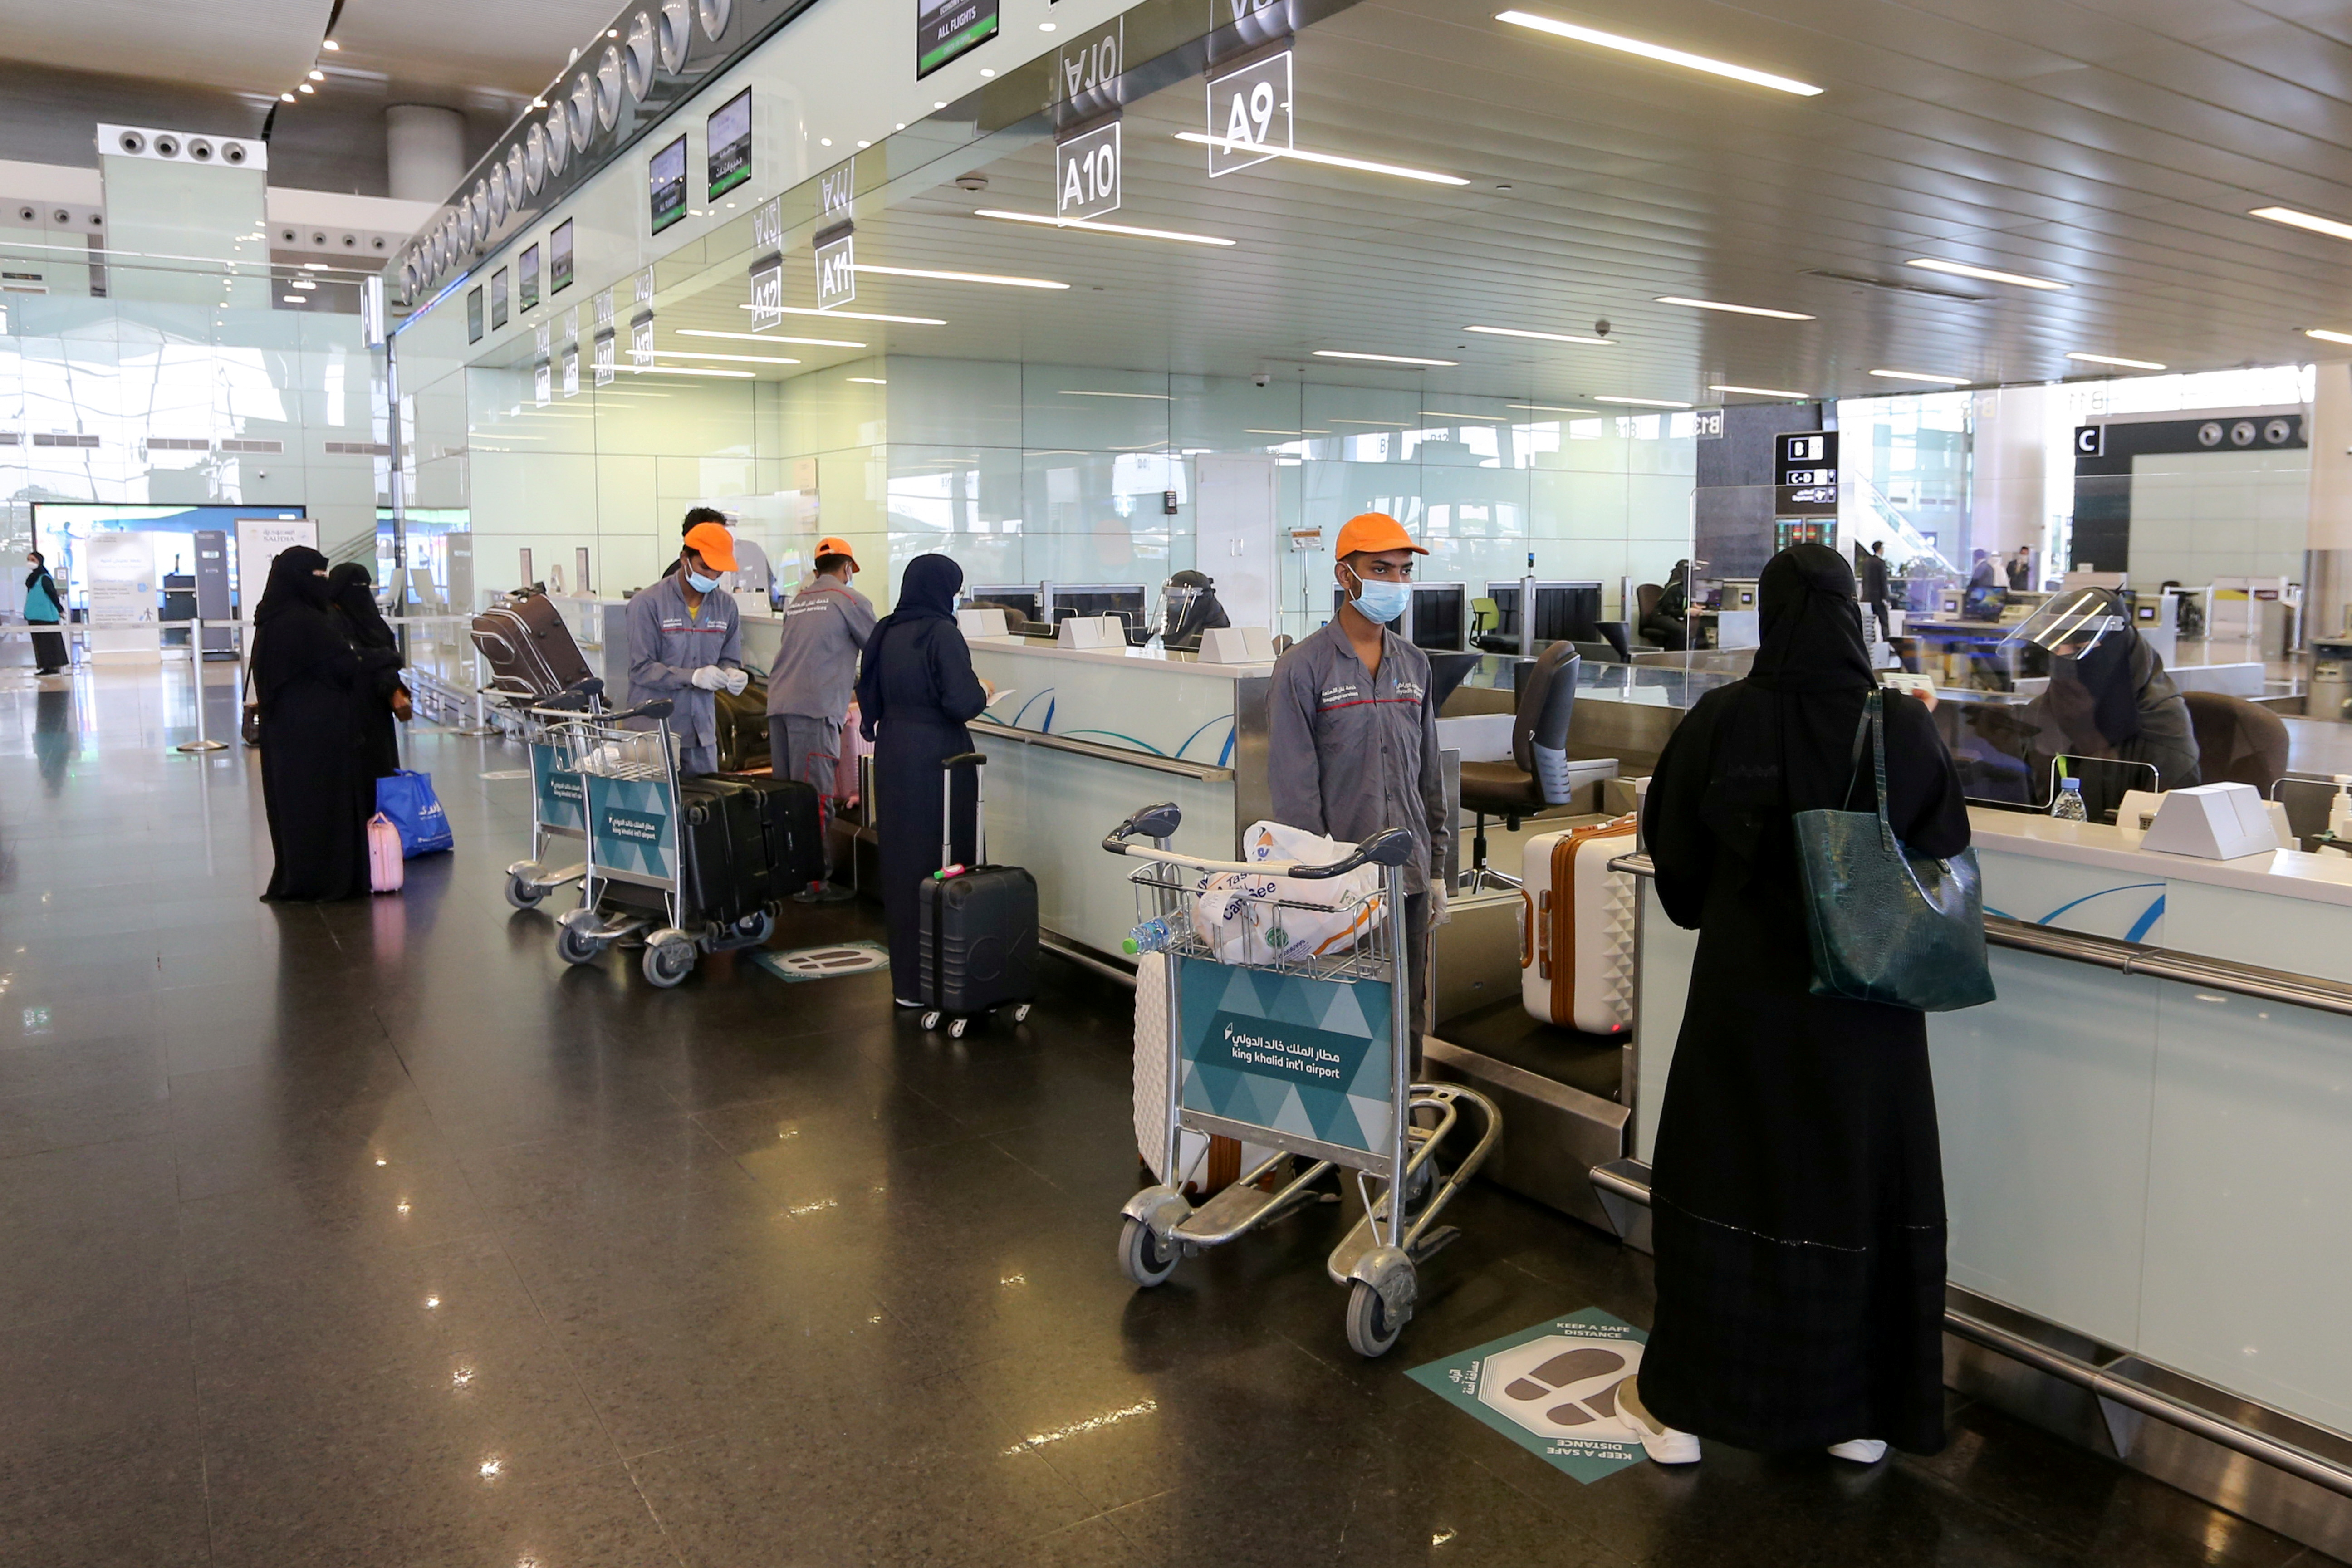 Passengers talk to airline employees at Riyadh International Airport, after Saudi Arabia reopened domestic flights, following the outbreak of the coronavirus disease (COVID-19), in Riyadh, Saudi Arabia May 31, 2020. REUTERS/Ahmed Yosri/File Photo